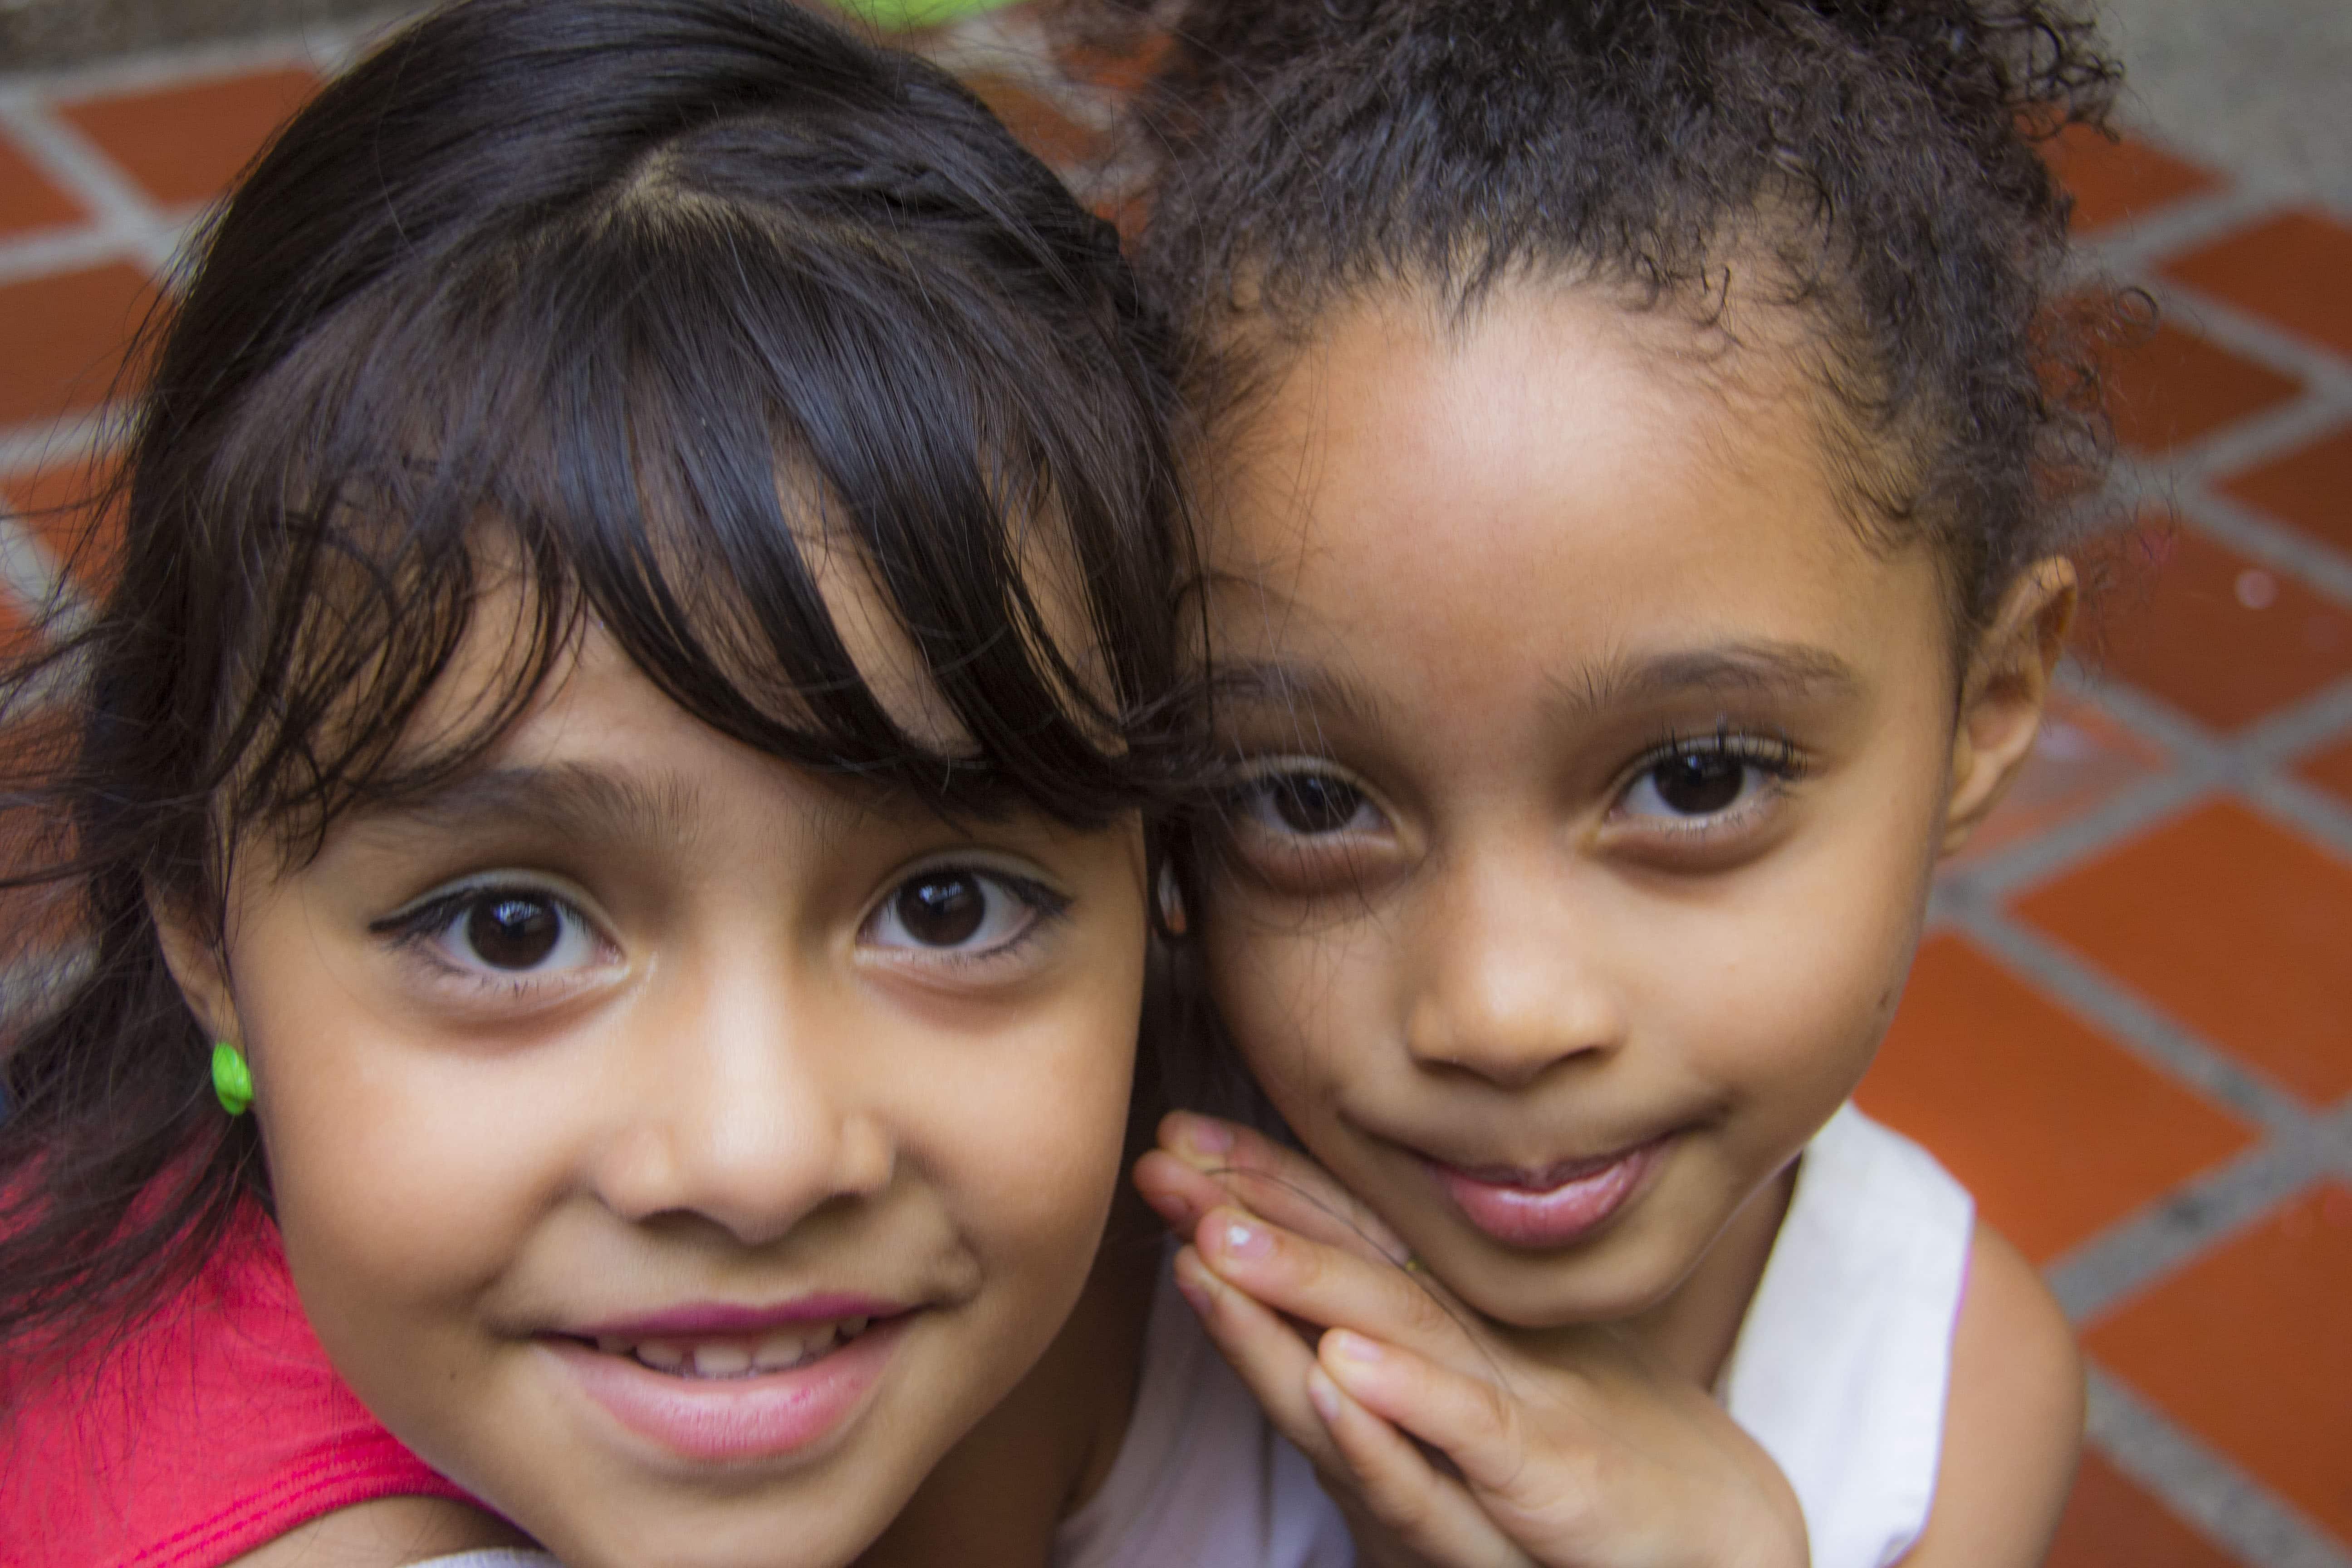 Colombia kids project, Medellin